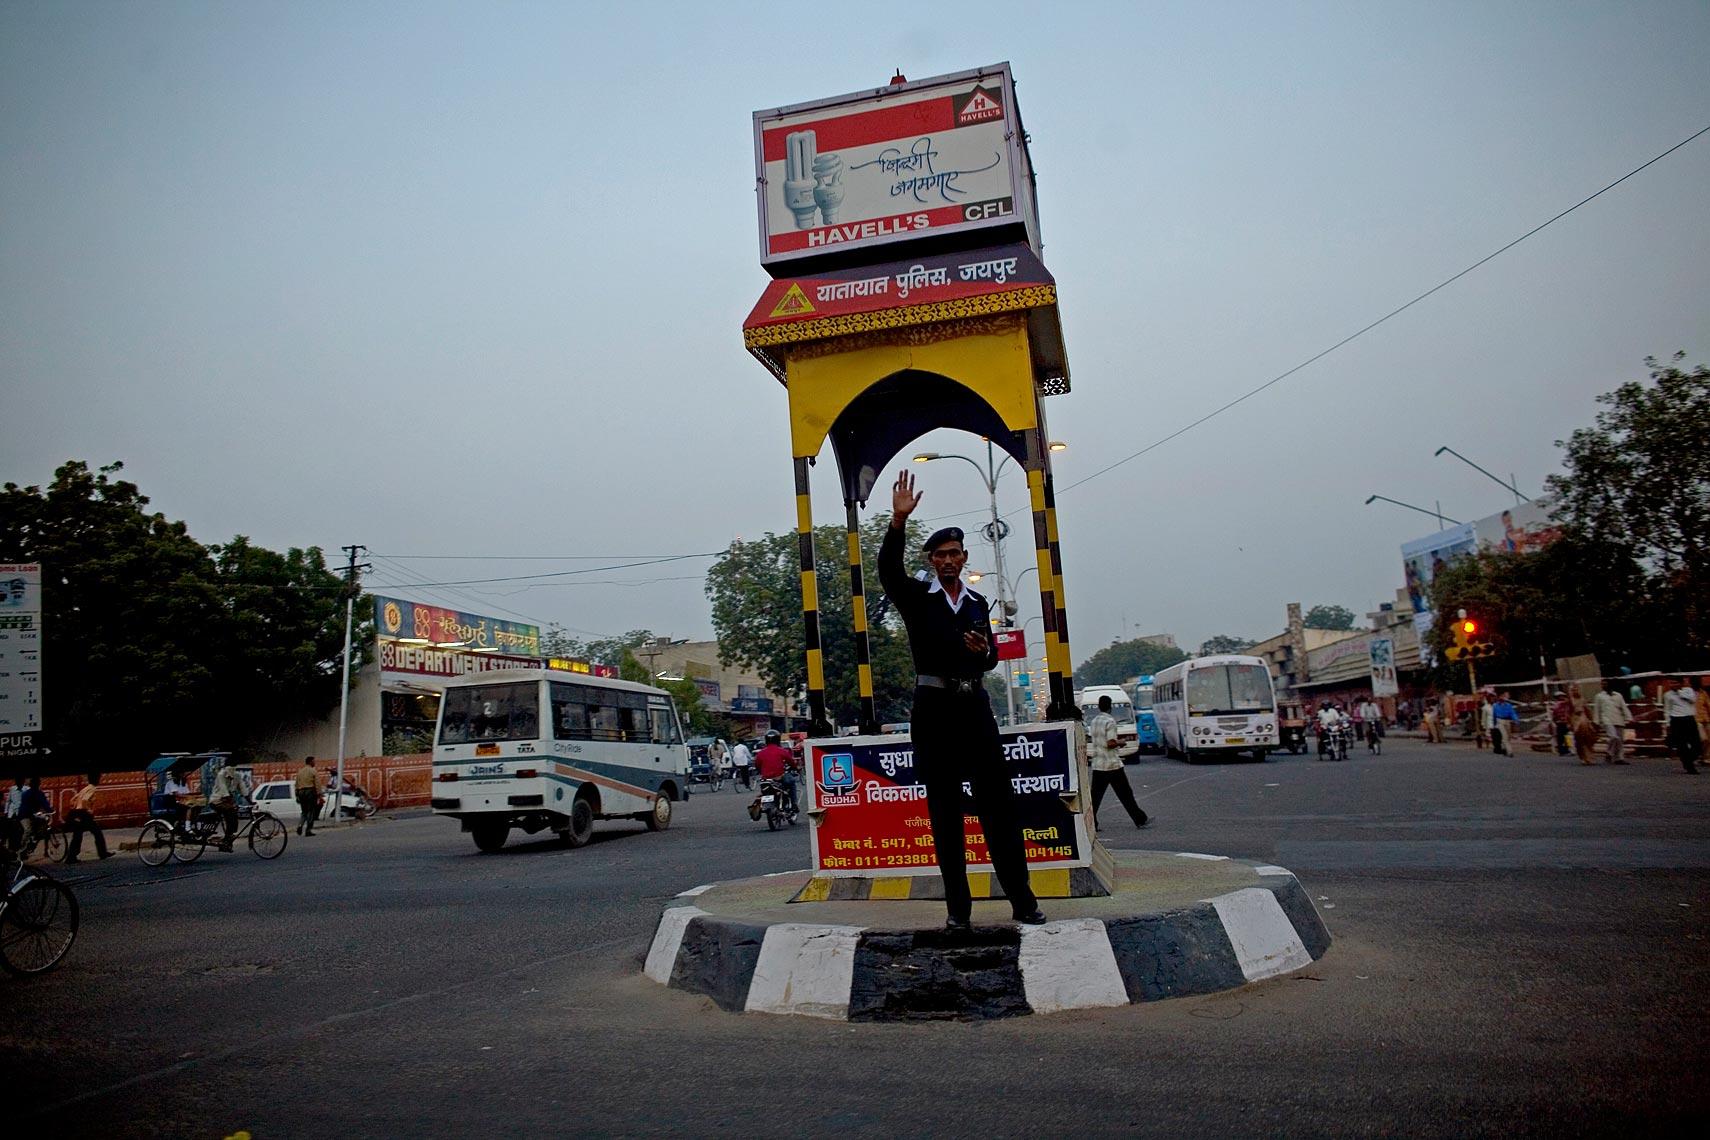 india014.jpg